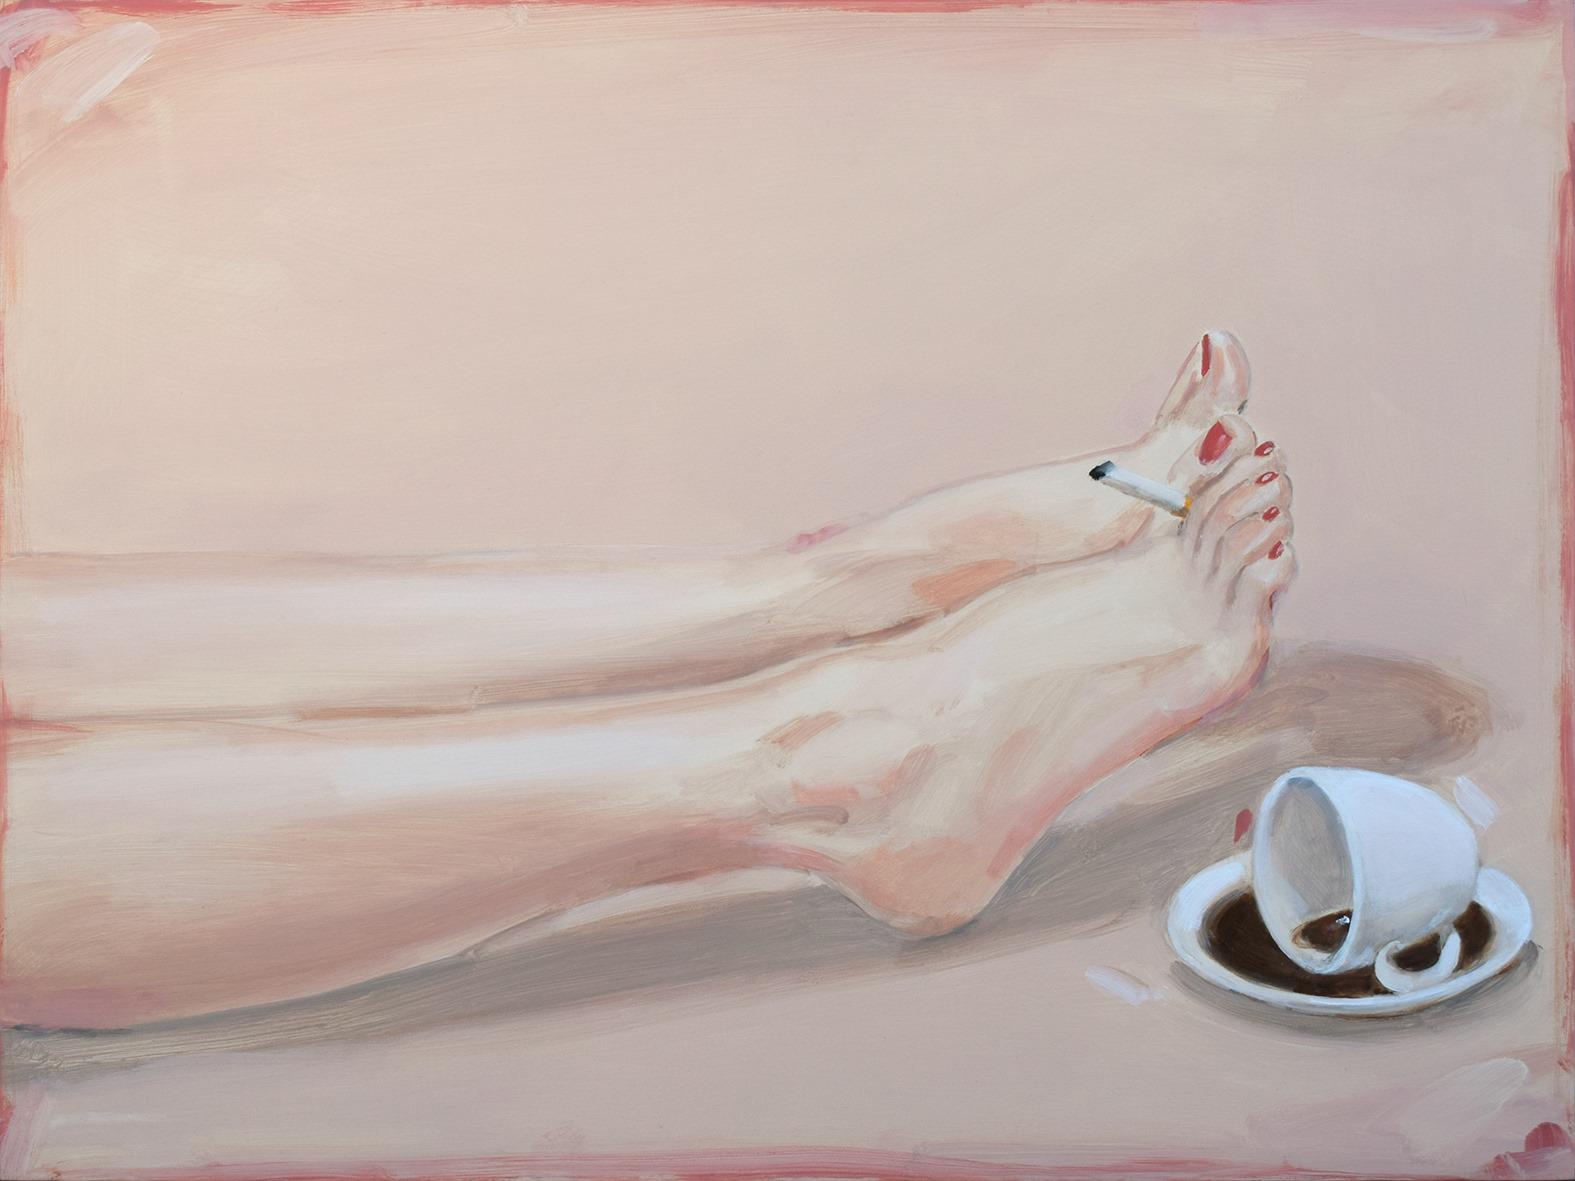 romina-bassu-paintings-everythingwithatwist-01